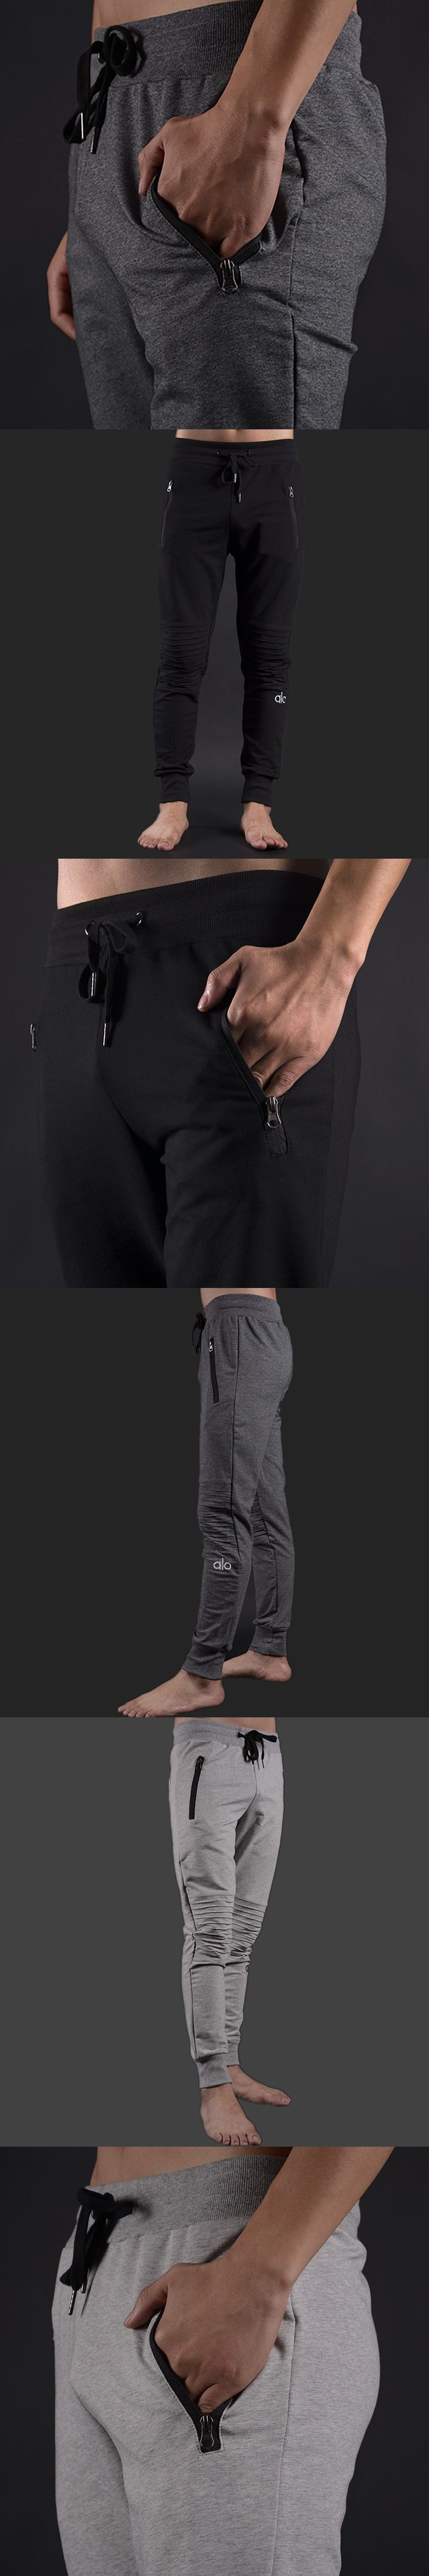 New Winter Men Casual gyms Fashion Sweatpants male fitness workout Cotton trousers sportswear Jogger Brand Pencil Long Pants XXL